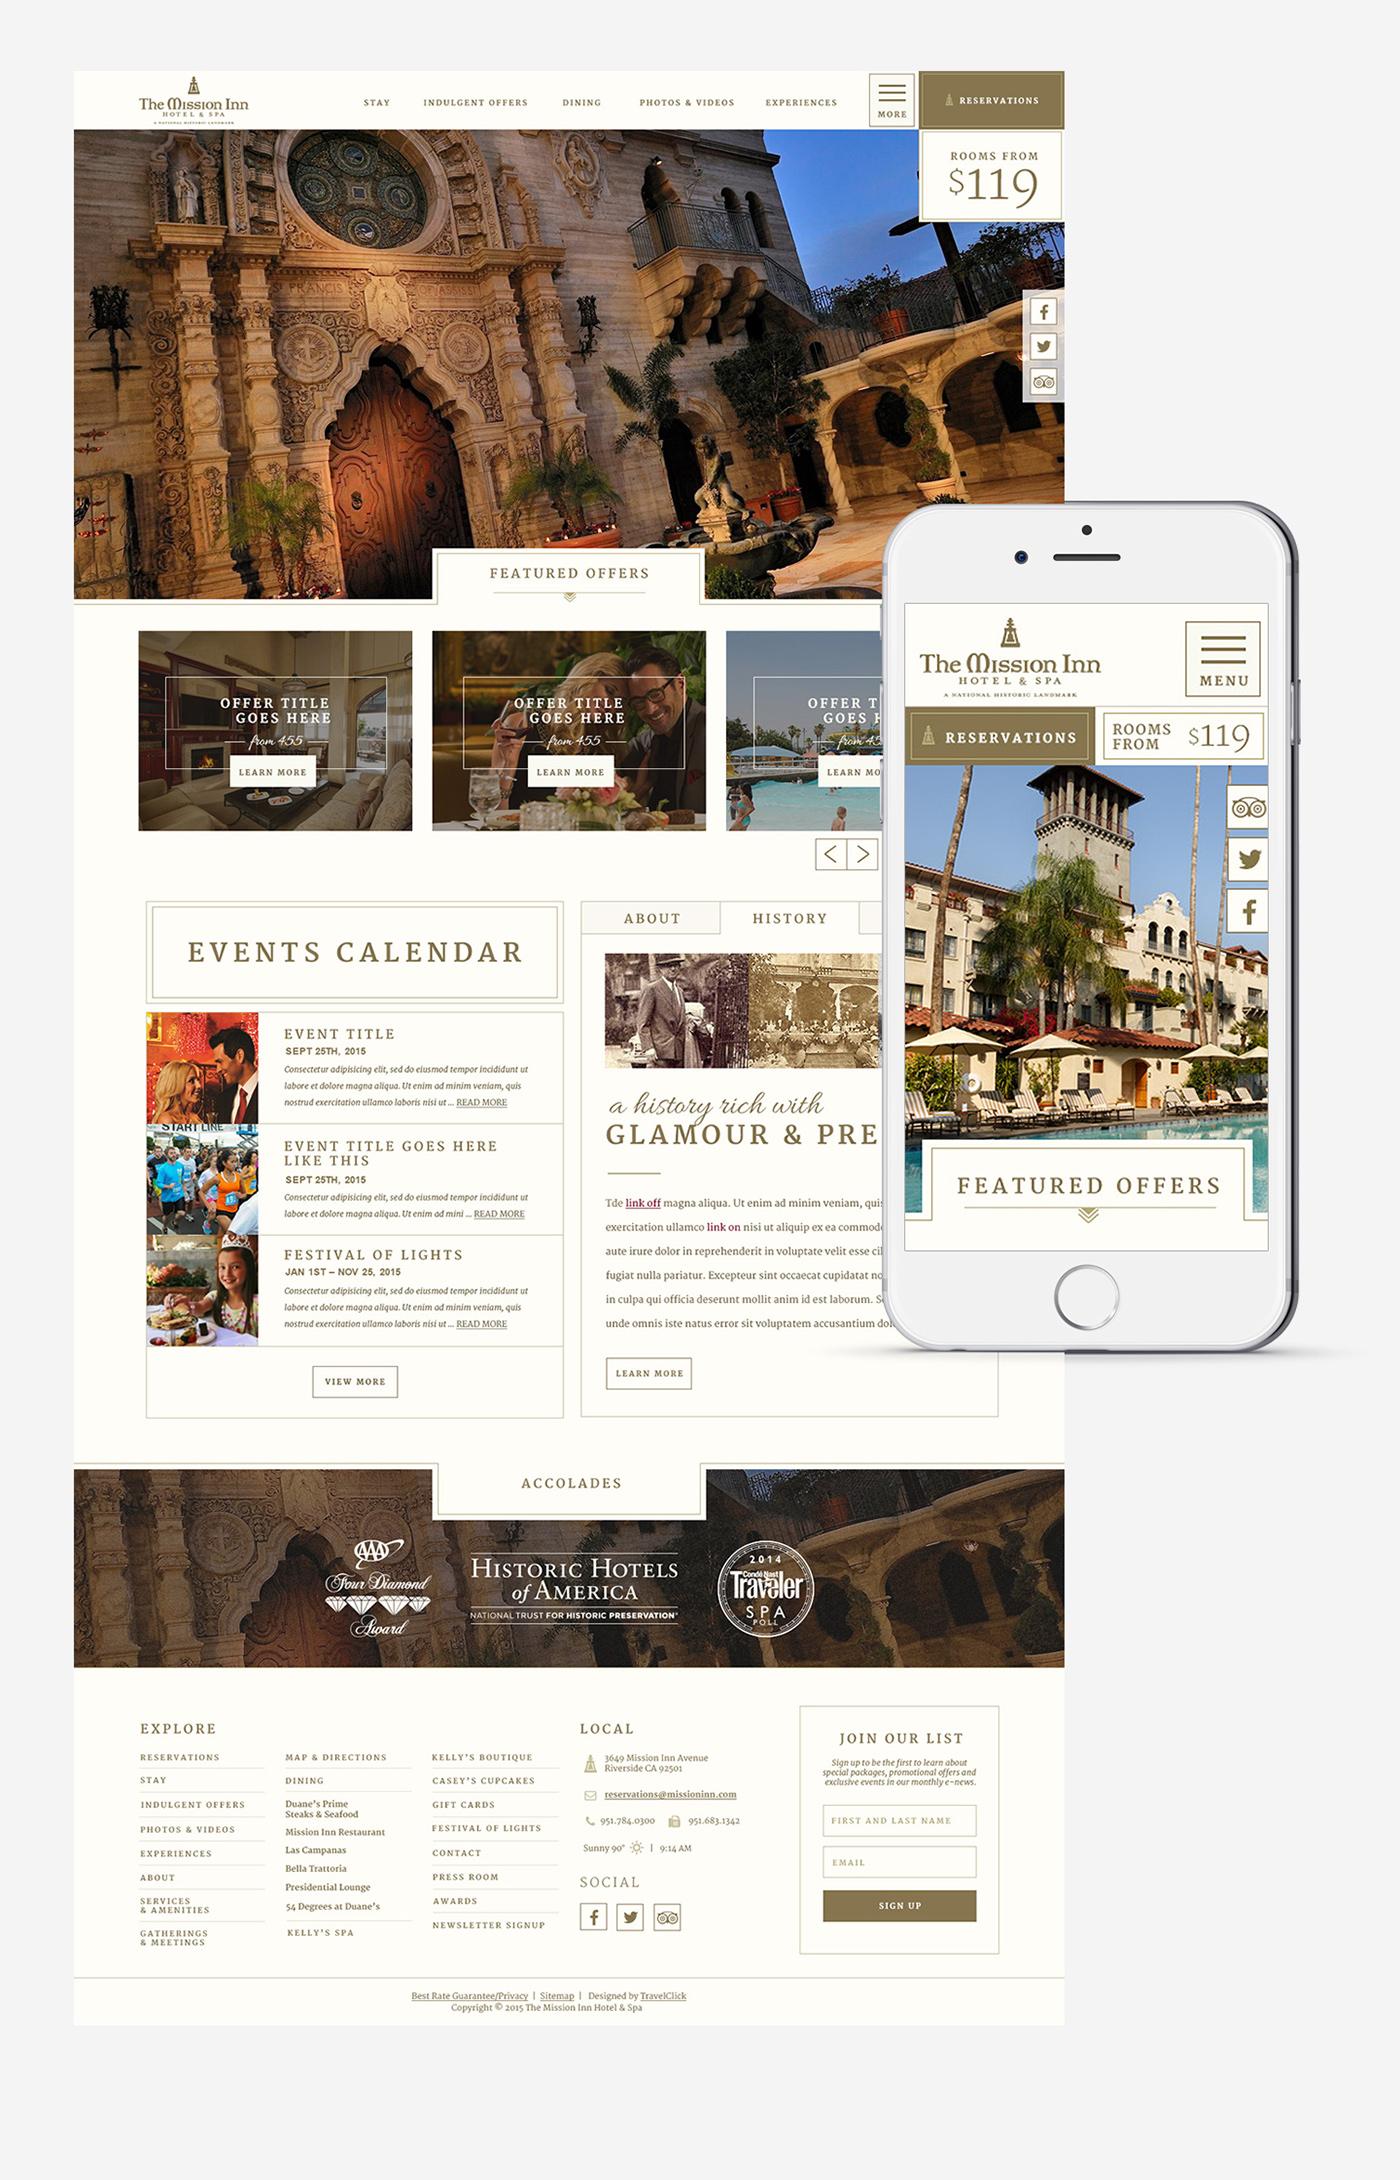 hotel hostpitality resort historical Website Webdesign Responsive UI conversion ux